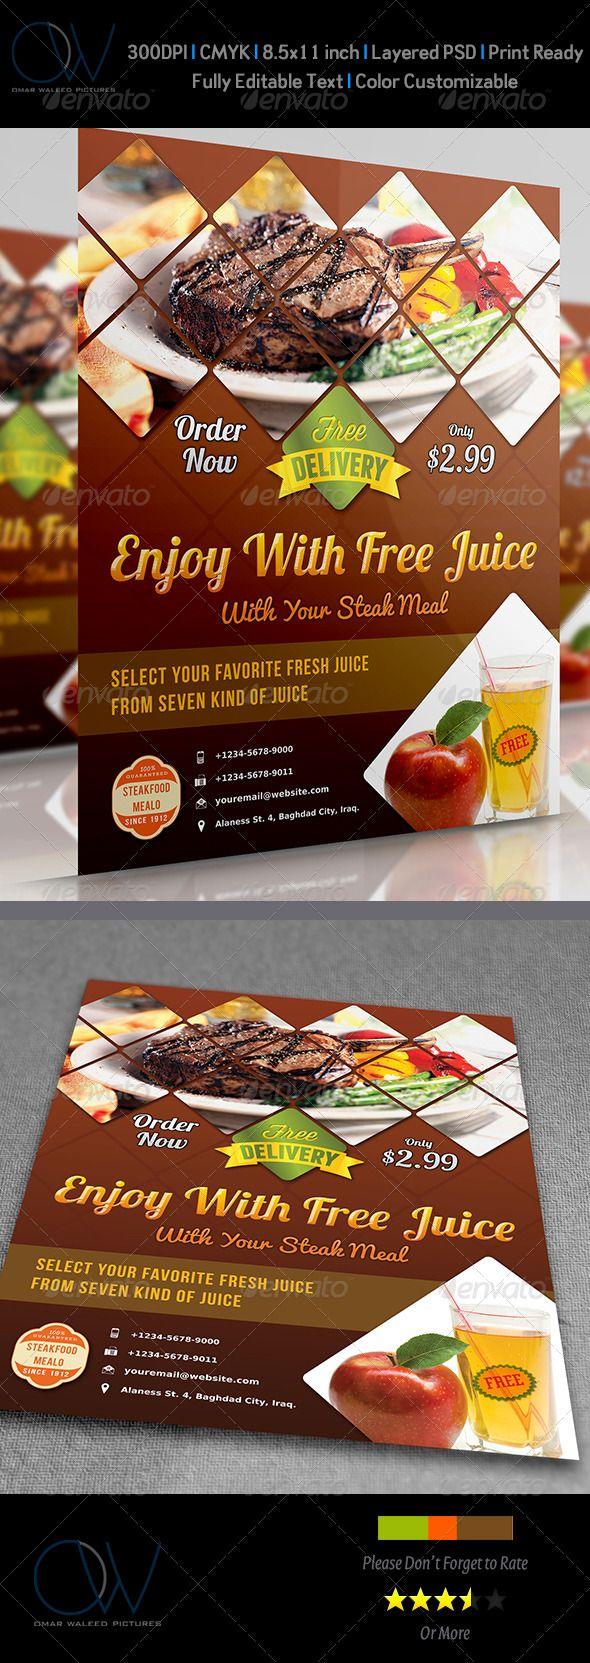 Steak Restaurant Flyer   Restaurante, Diseño corporativo y Bebidas